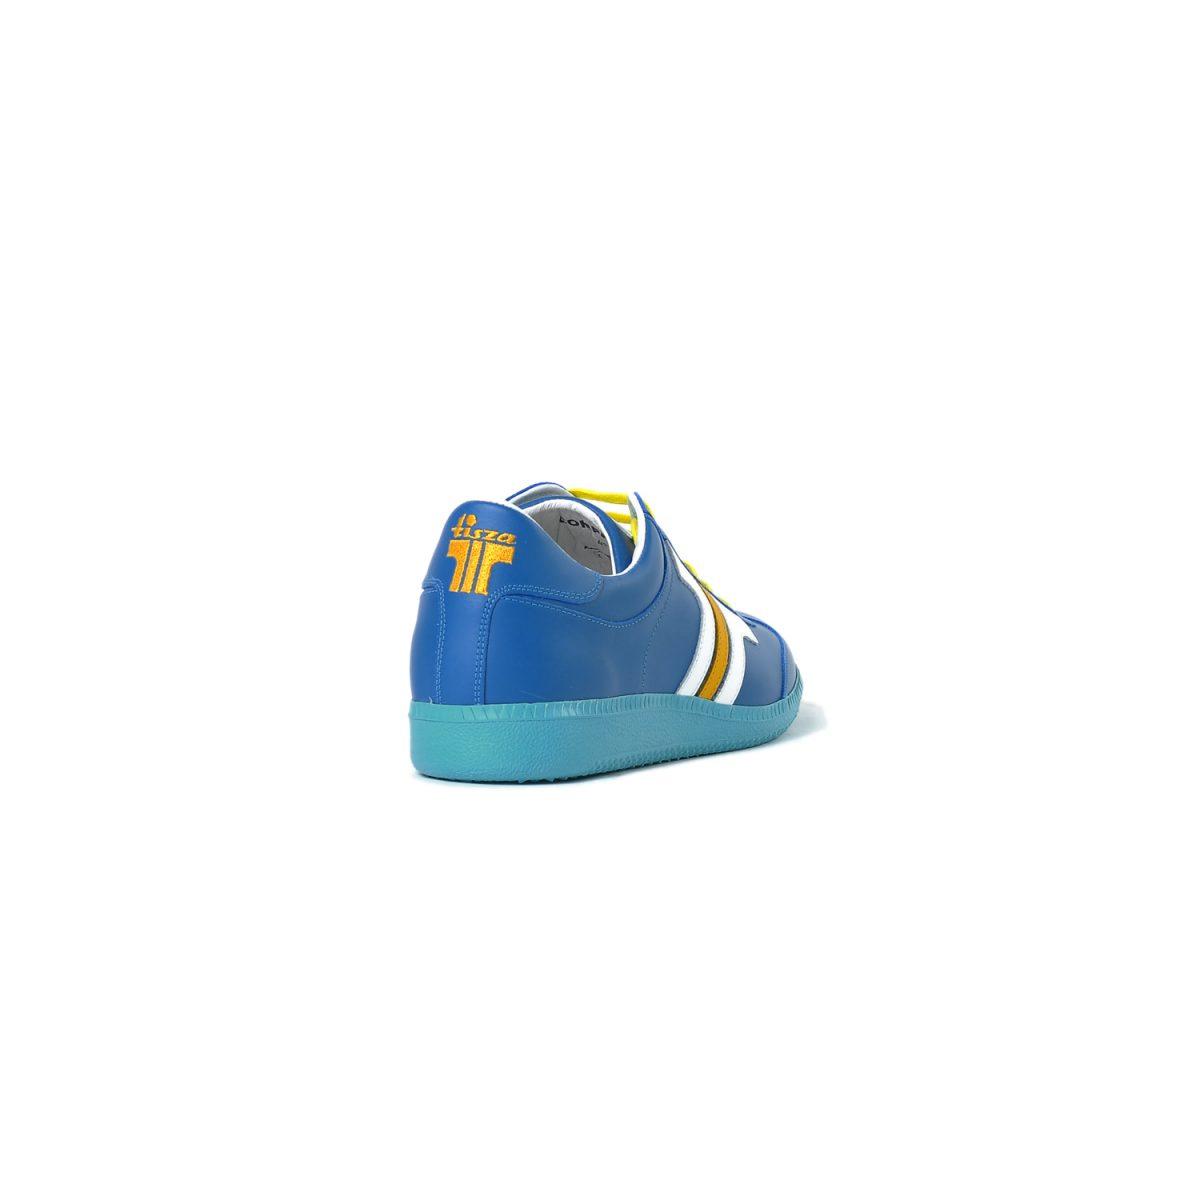 Tisza shoes - Compakt - Costa Rica